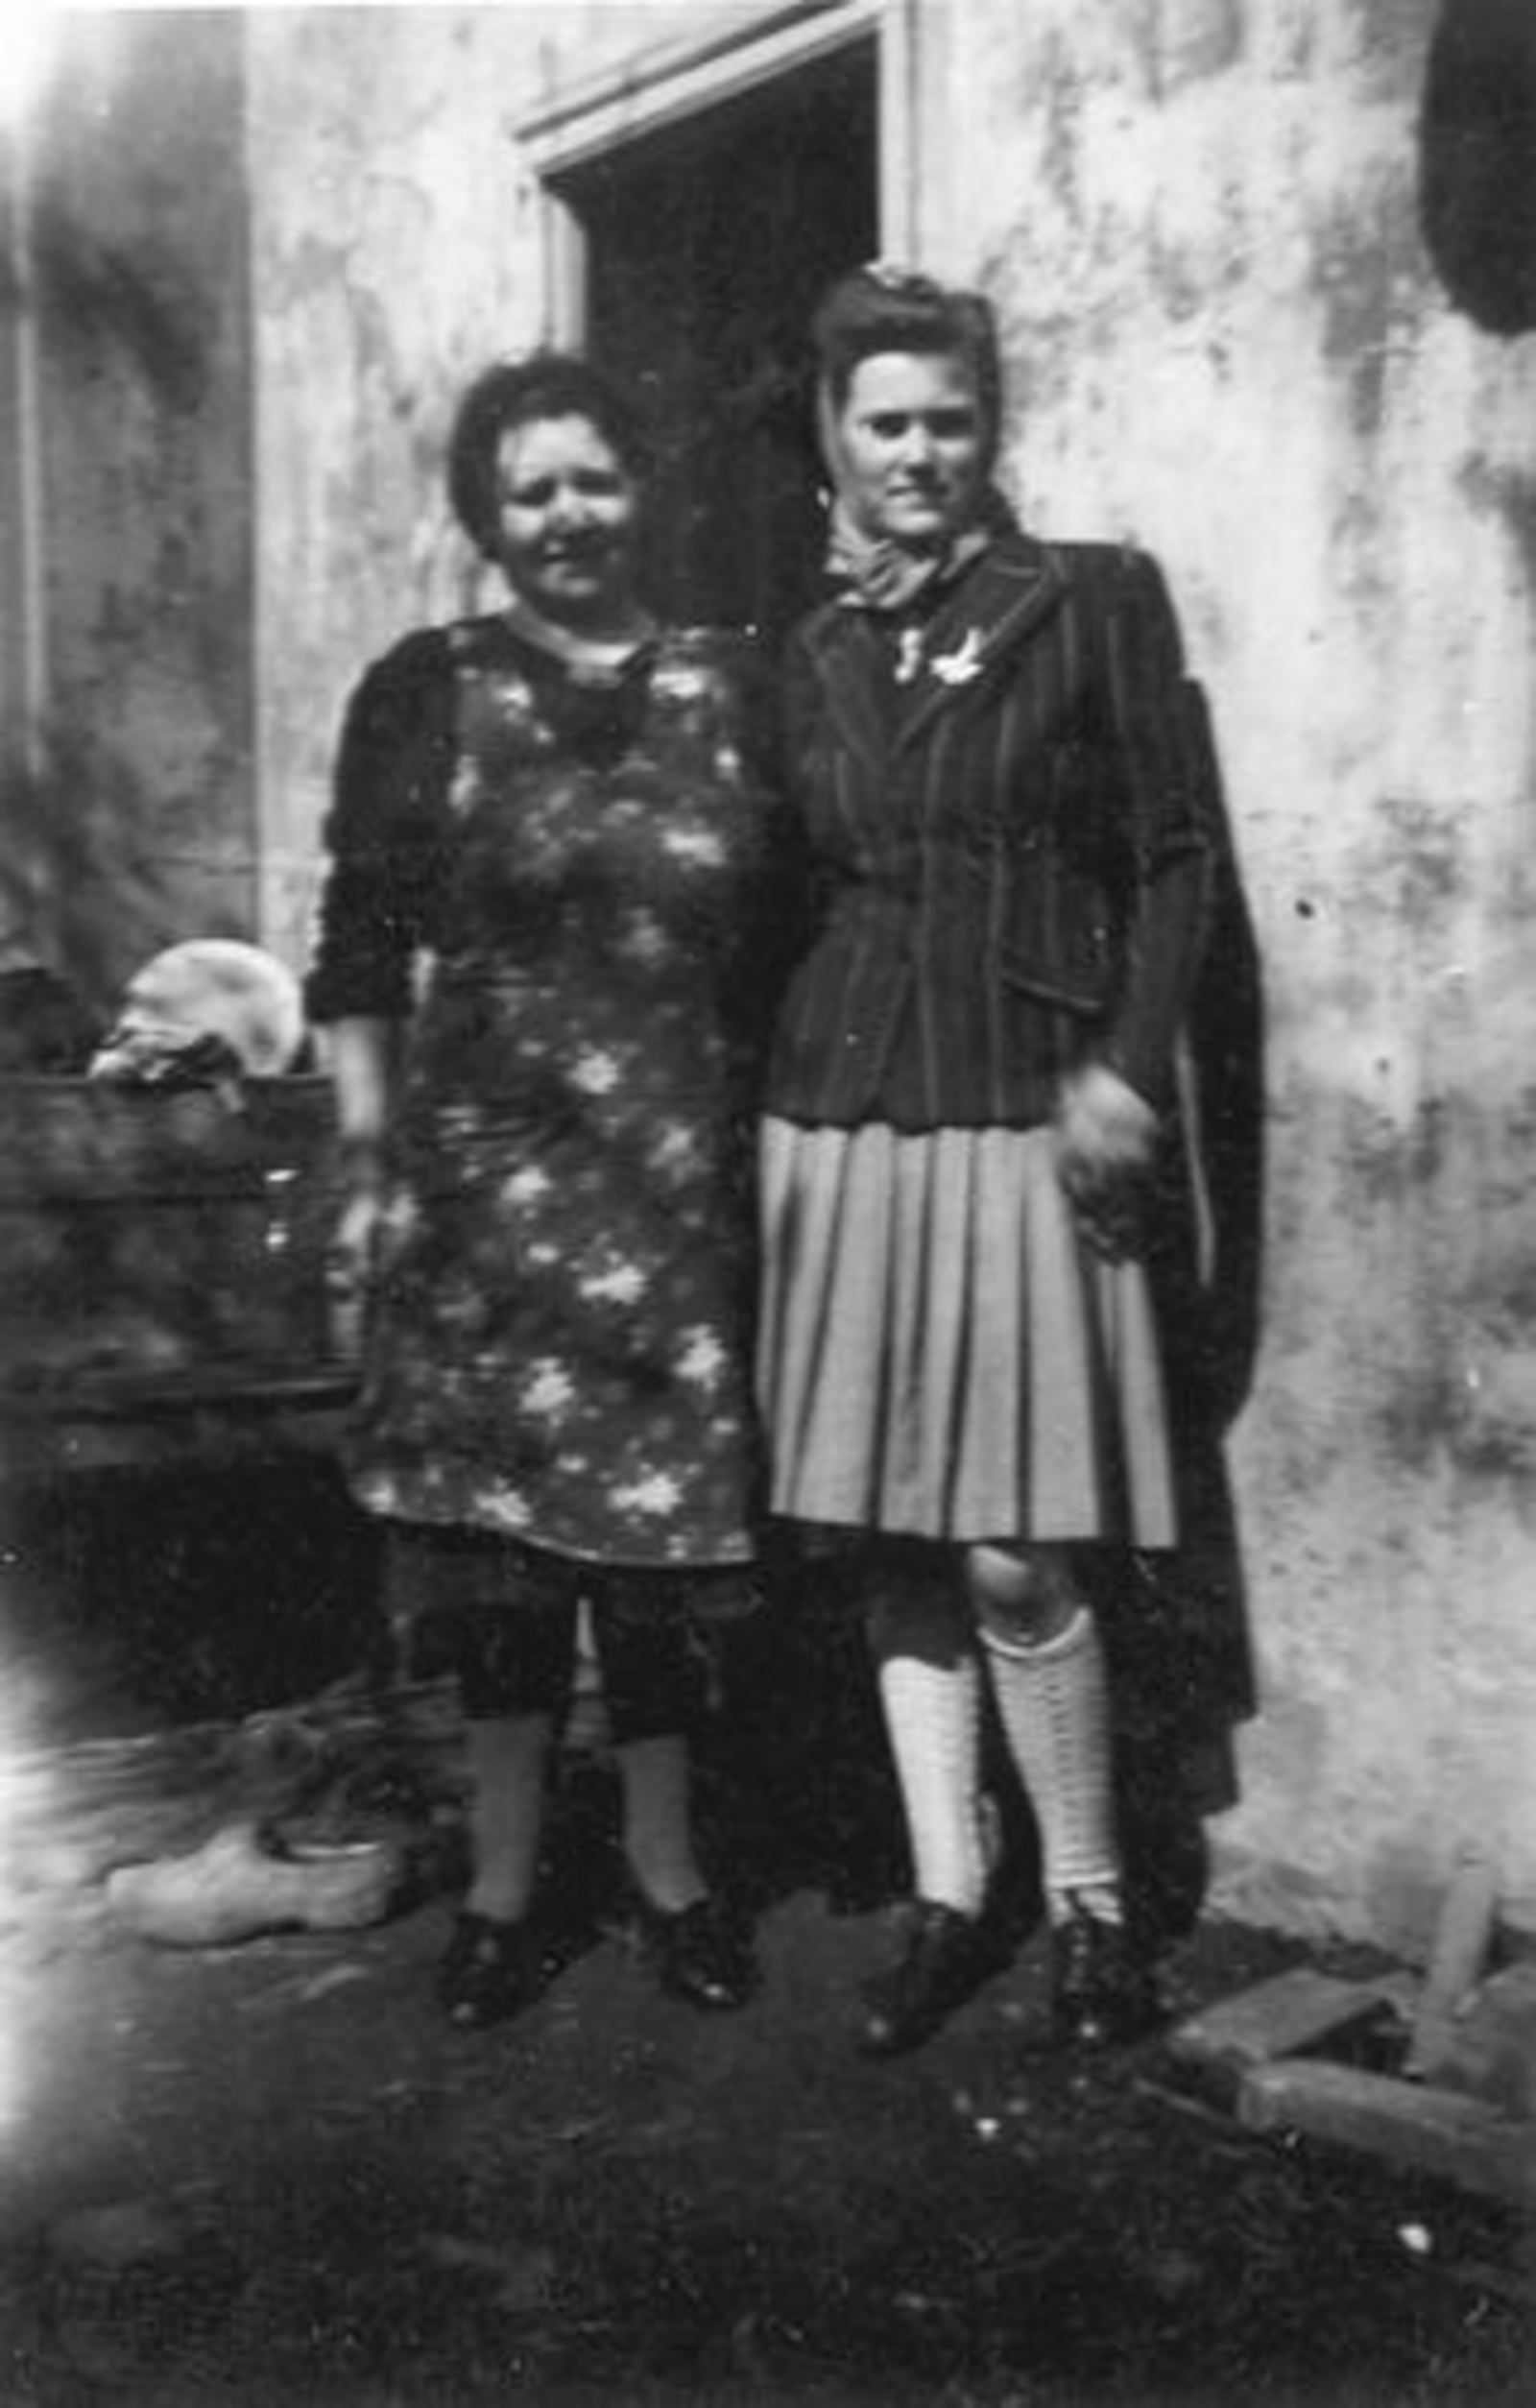 Galis Nanning 1946 vrouw Anna M vd Ban met Zwaantje Bosman